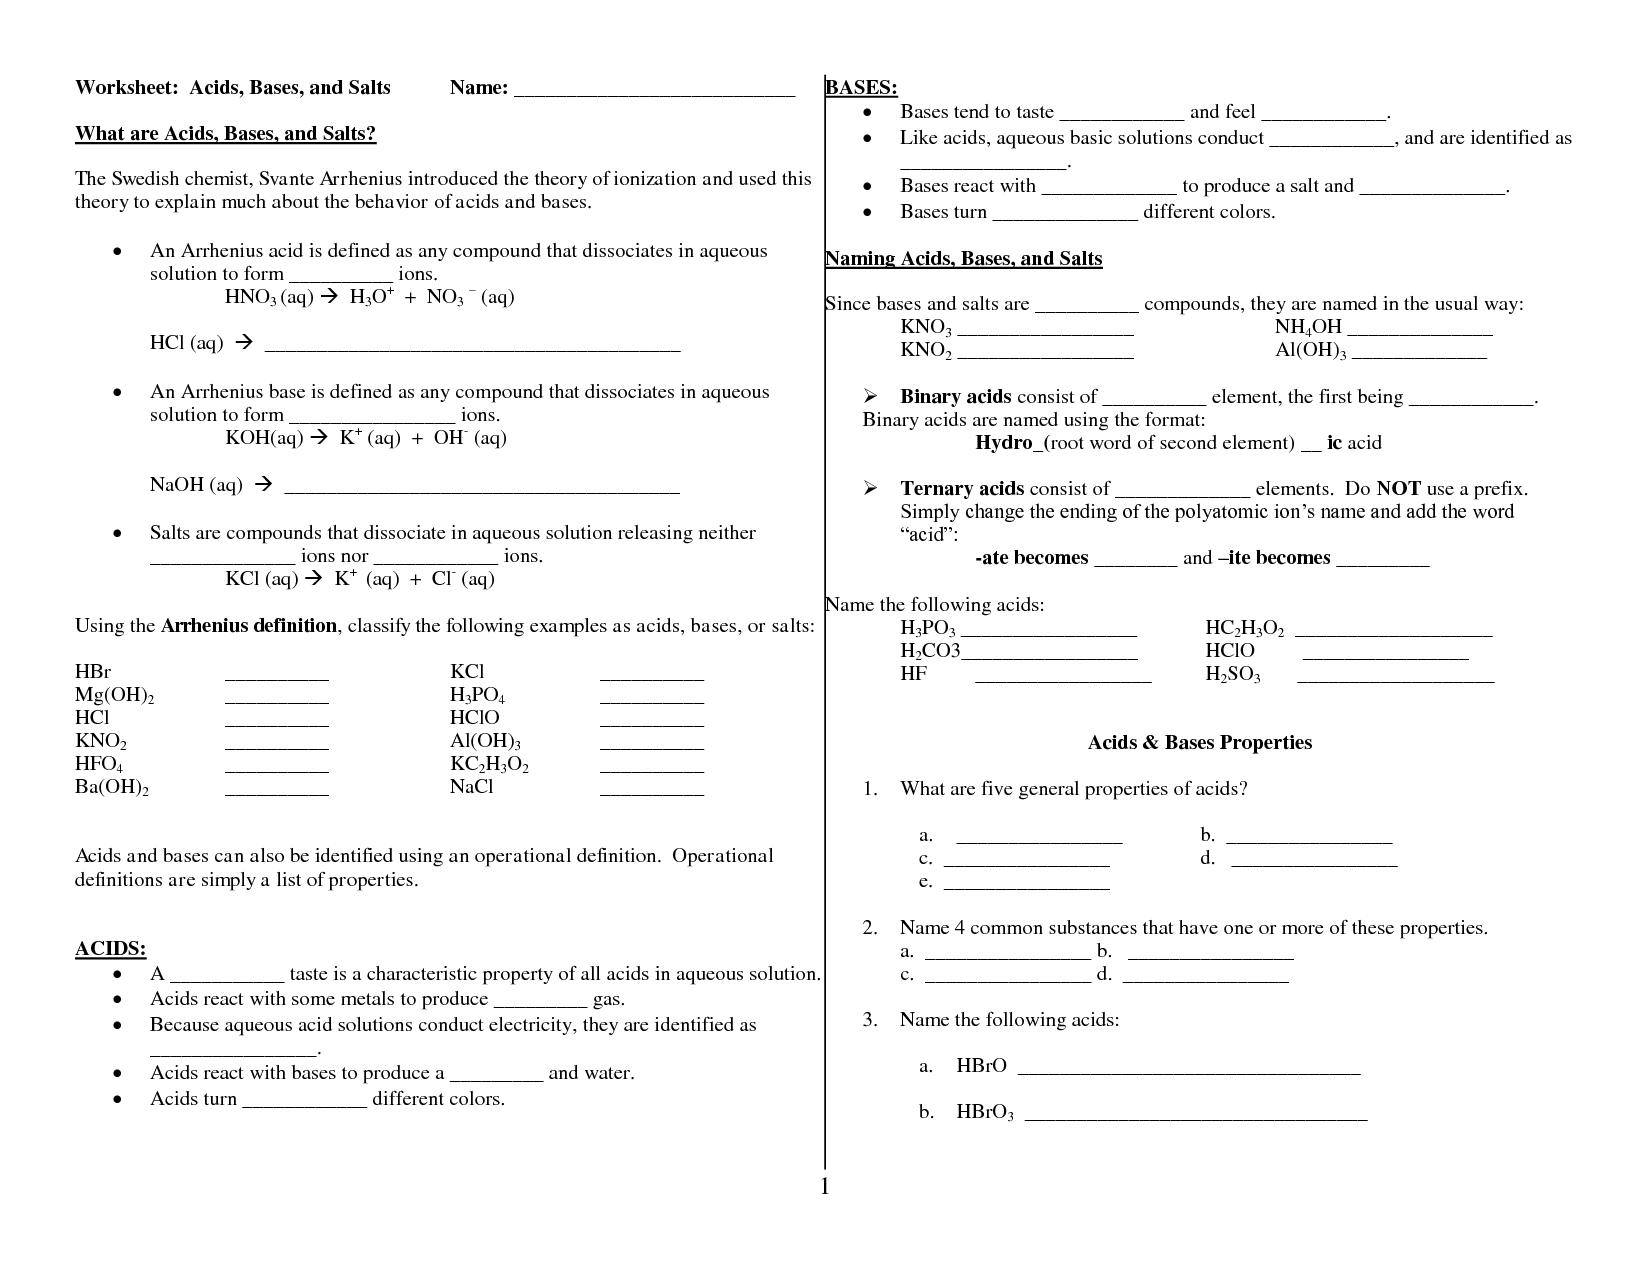 Worksheet Acids Bases And Salts Answer Key